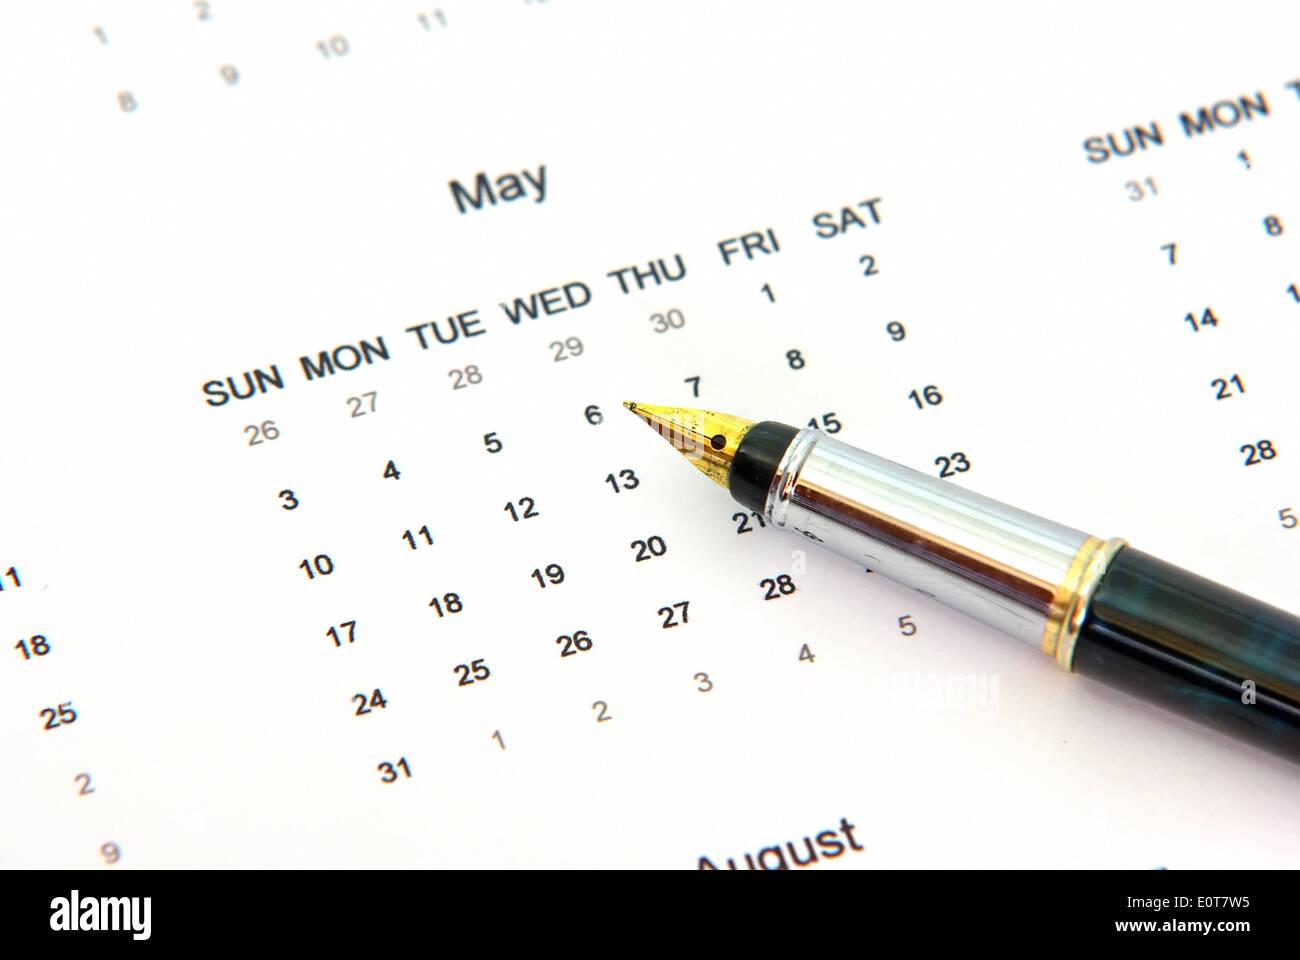 Close up of a calendar and a pen - Stock Image